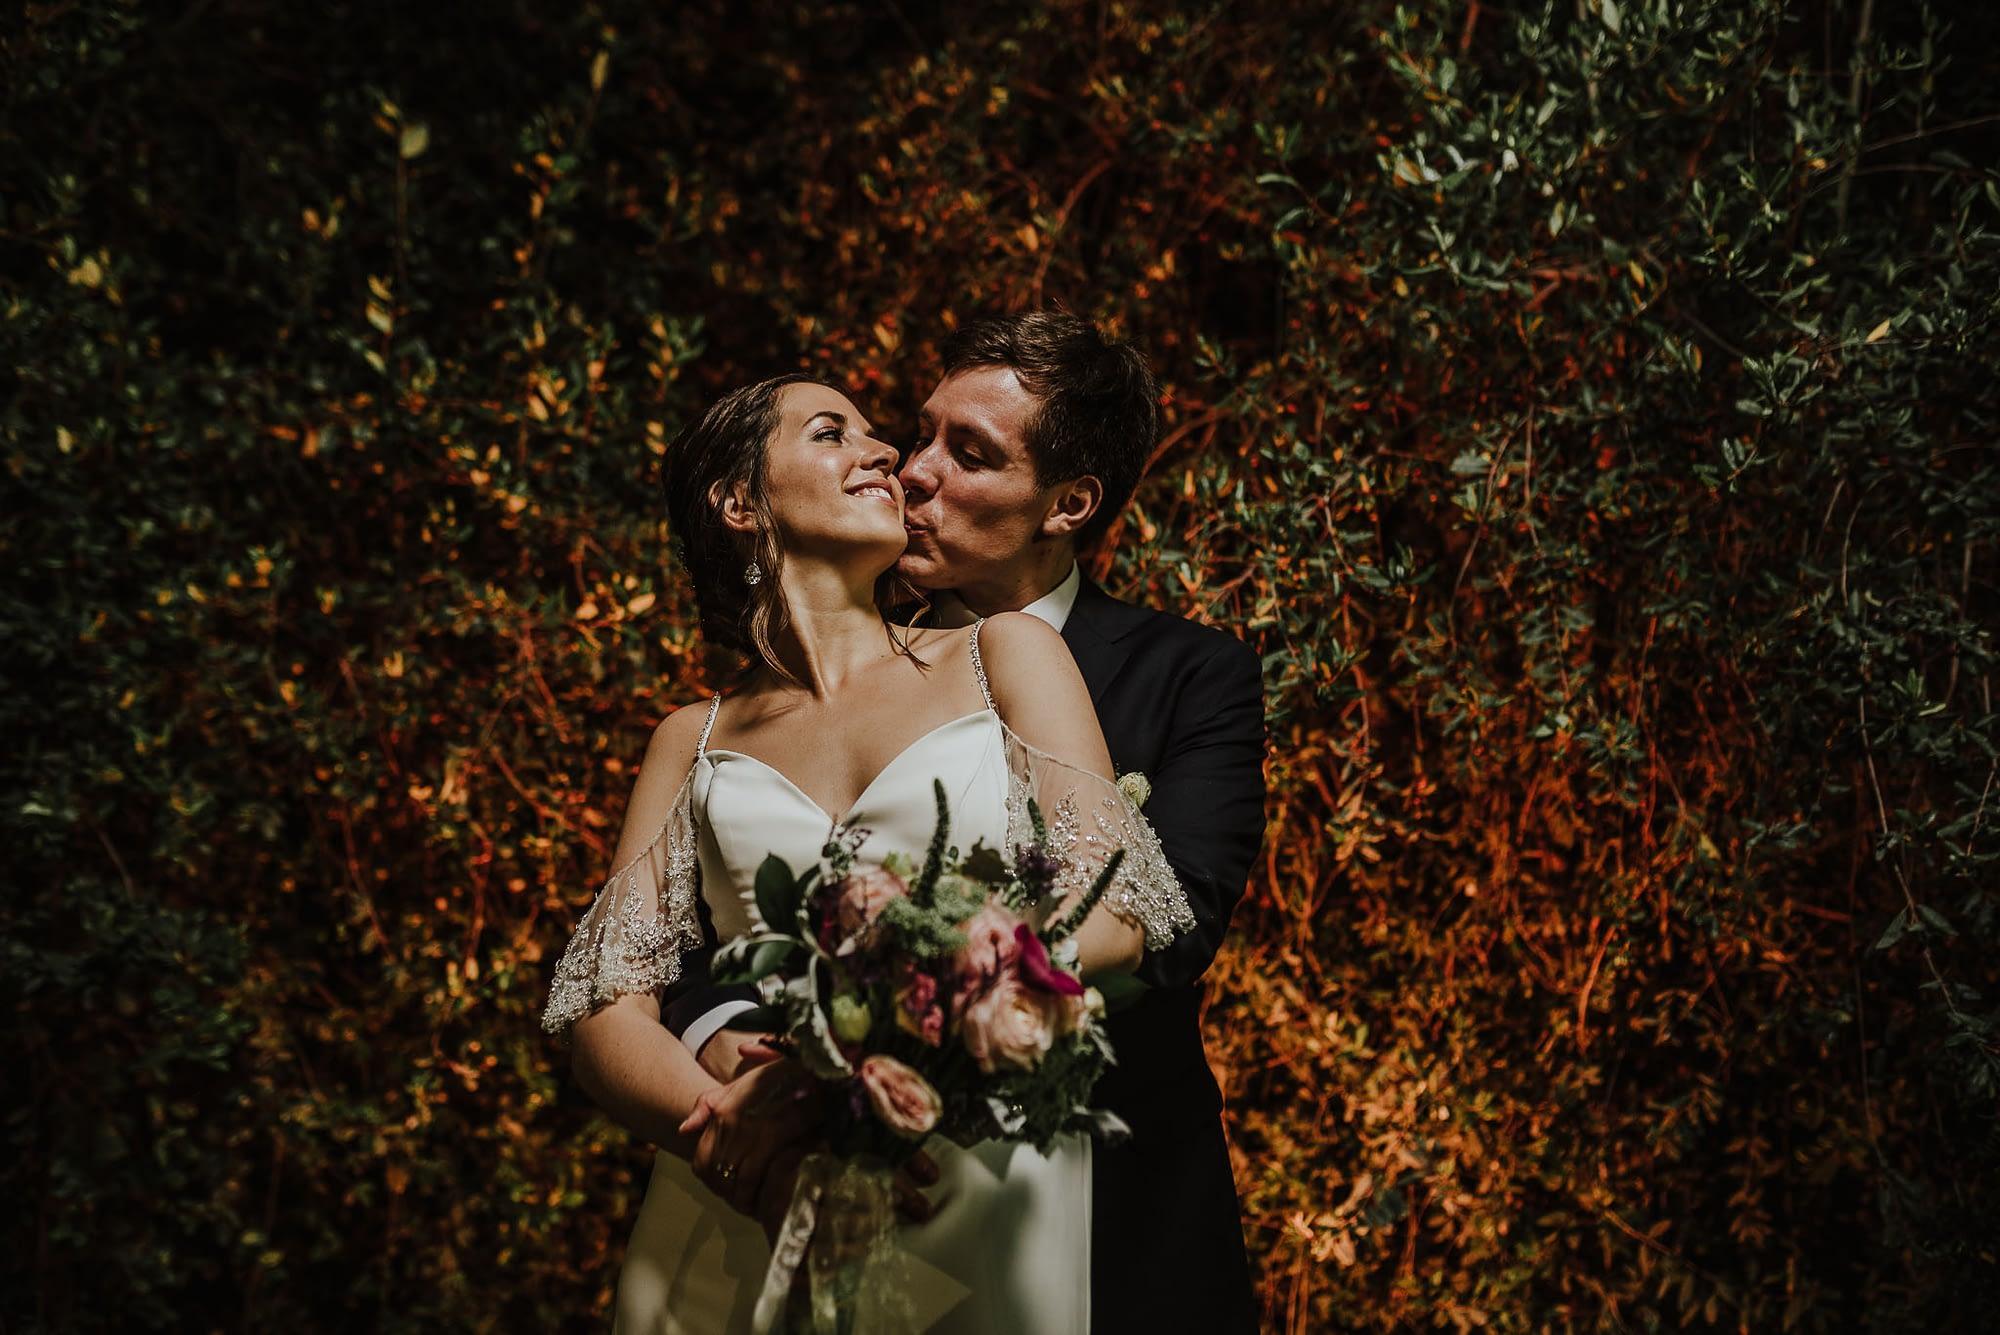 fotografo de matrimonios-preparativos novia-novia-sesion novios